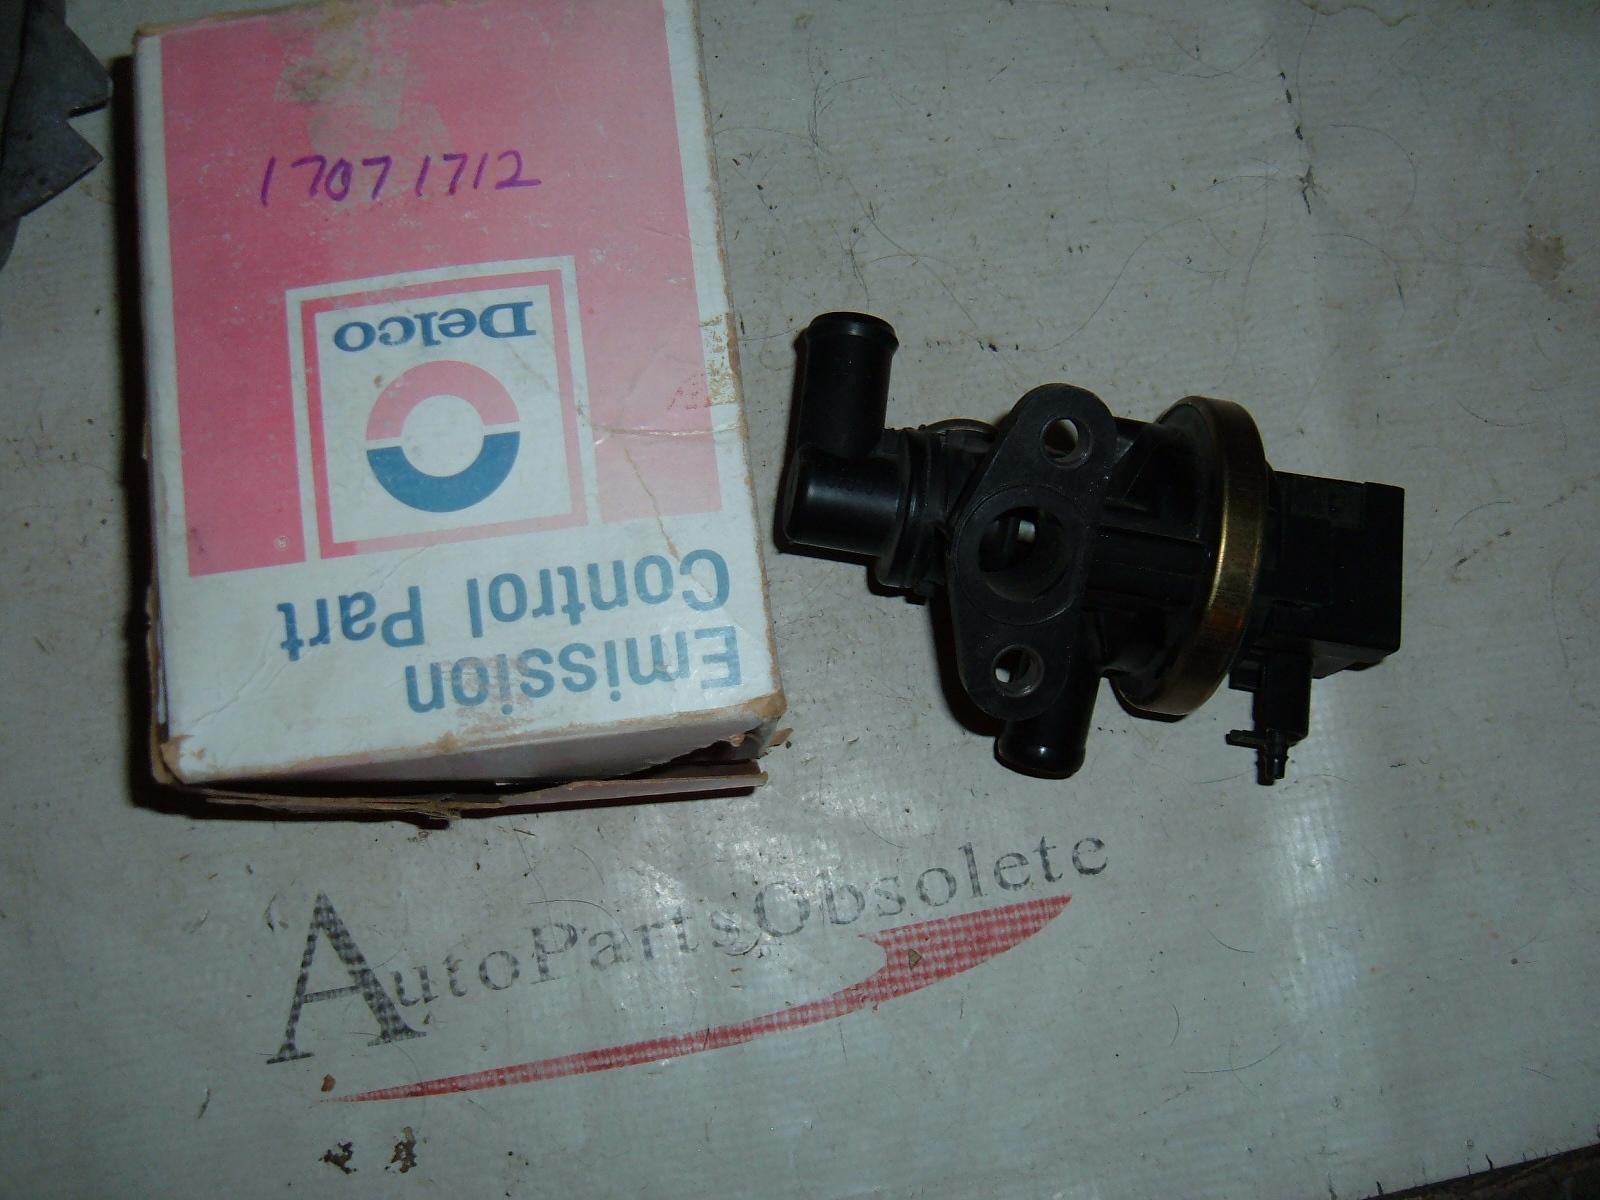 1981 82 83 pontiac buick oldsmobile cadillac diverter valve nos gm 17071712 (z 17071712)